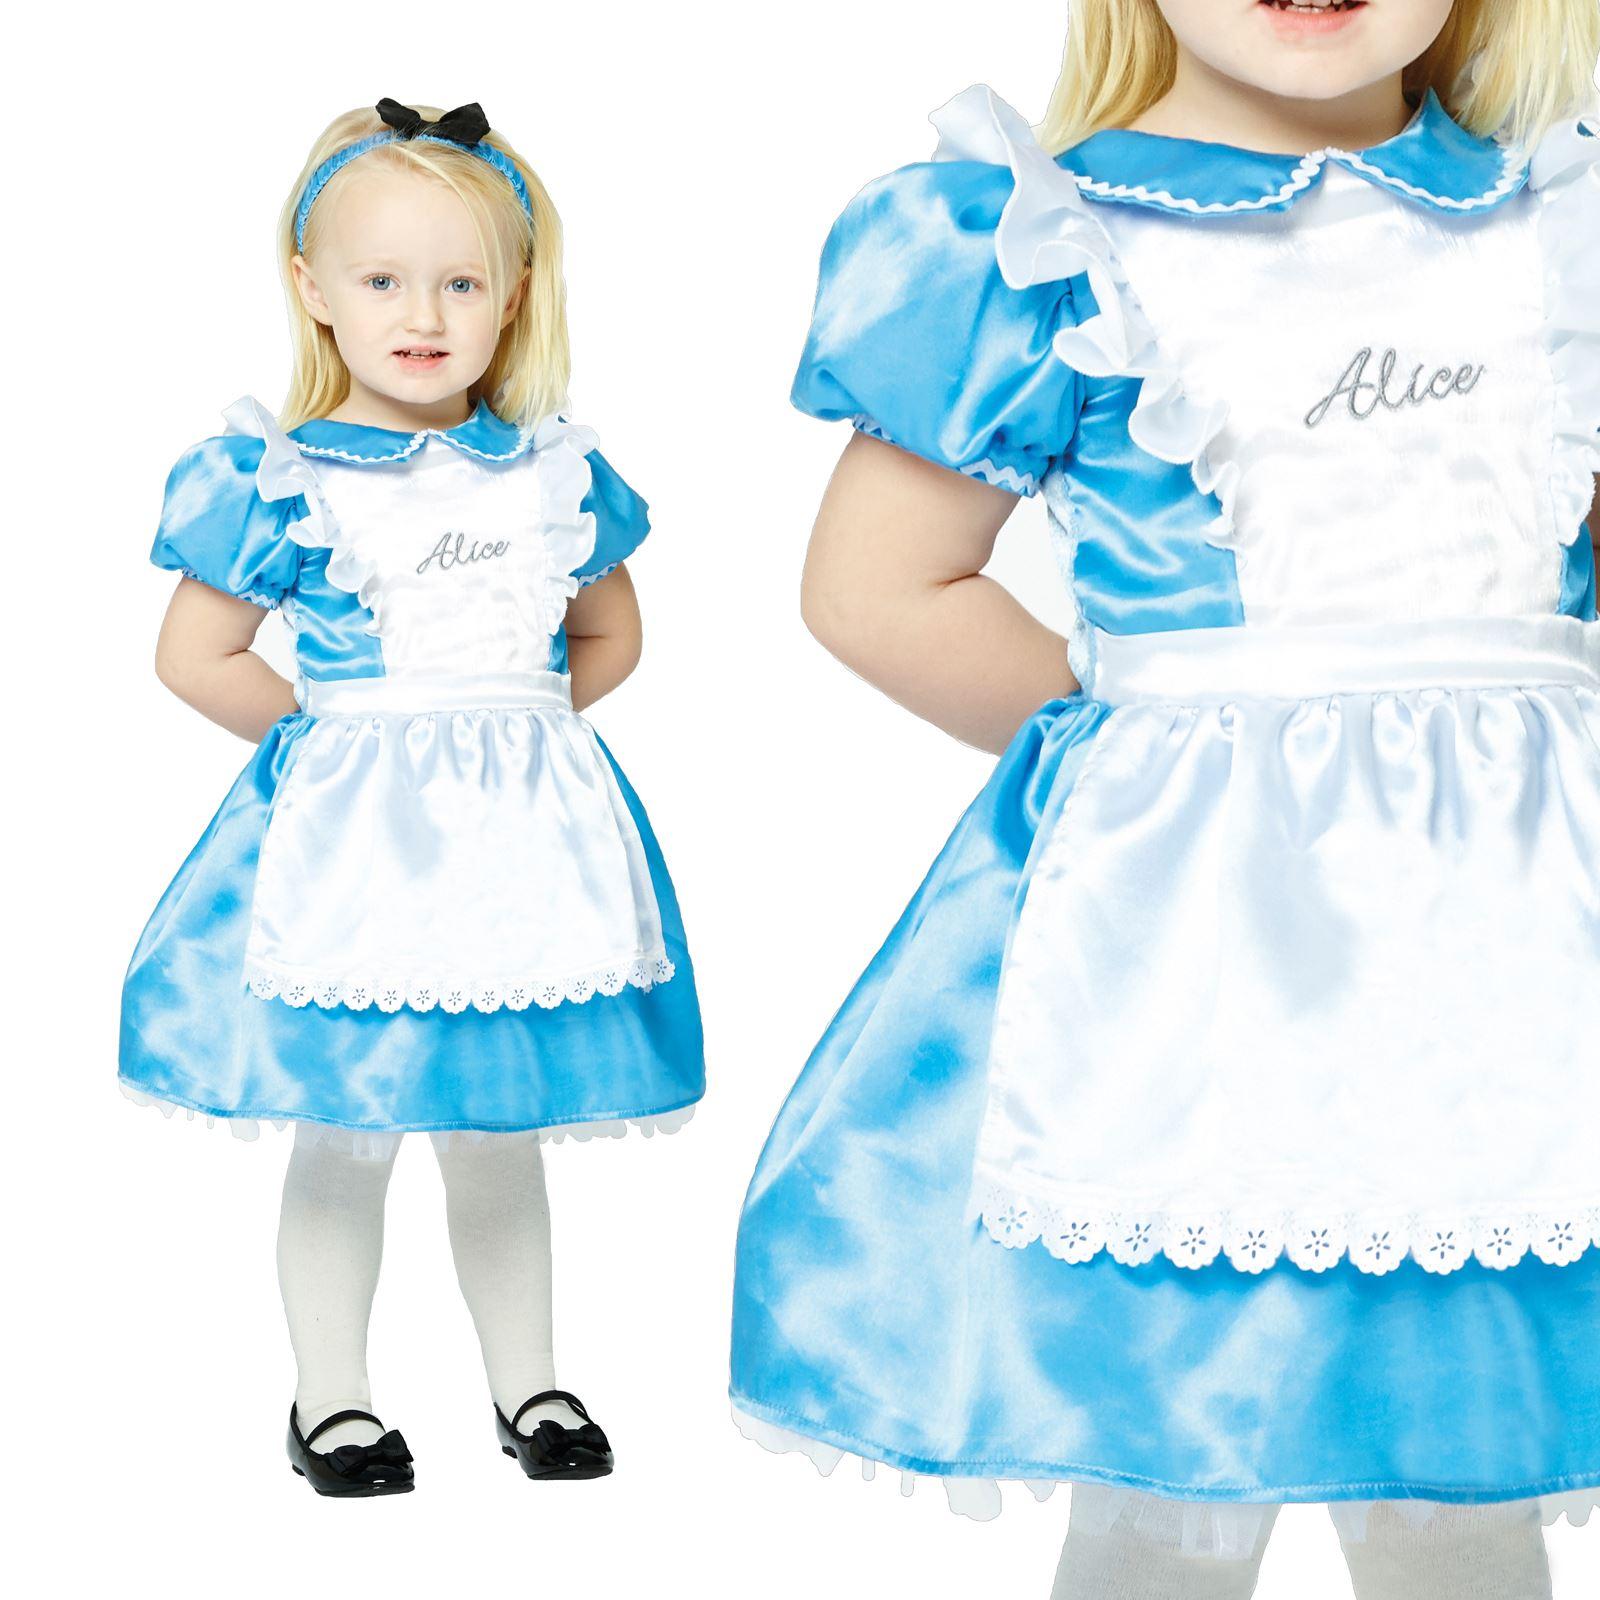 SteamPunk Alice in Wonderland Fairytales Alice Costume SIZE XS//SMALL NEW UNUSED